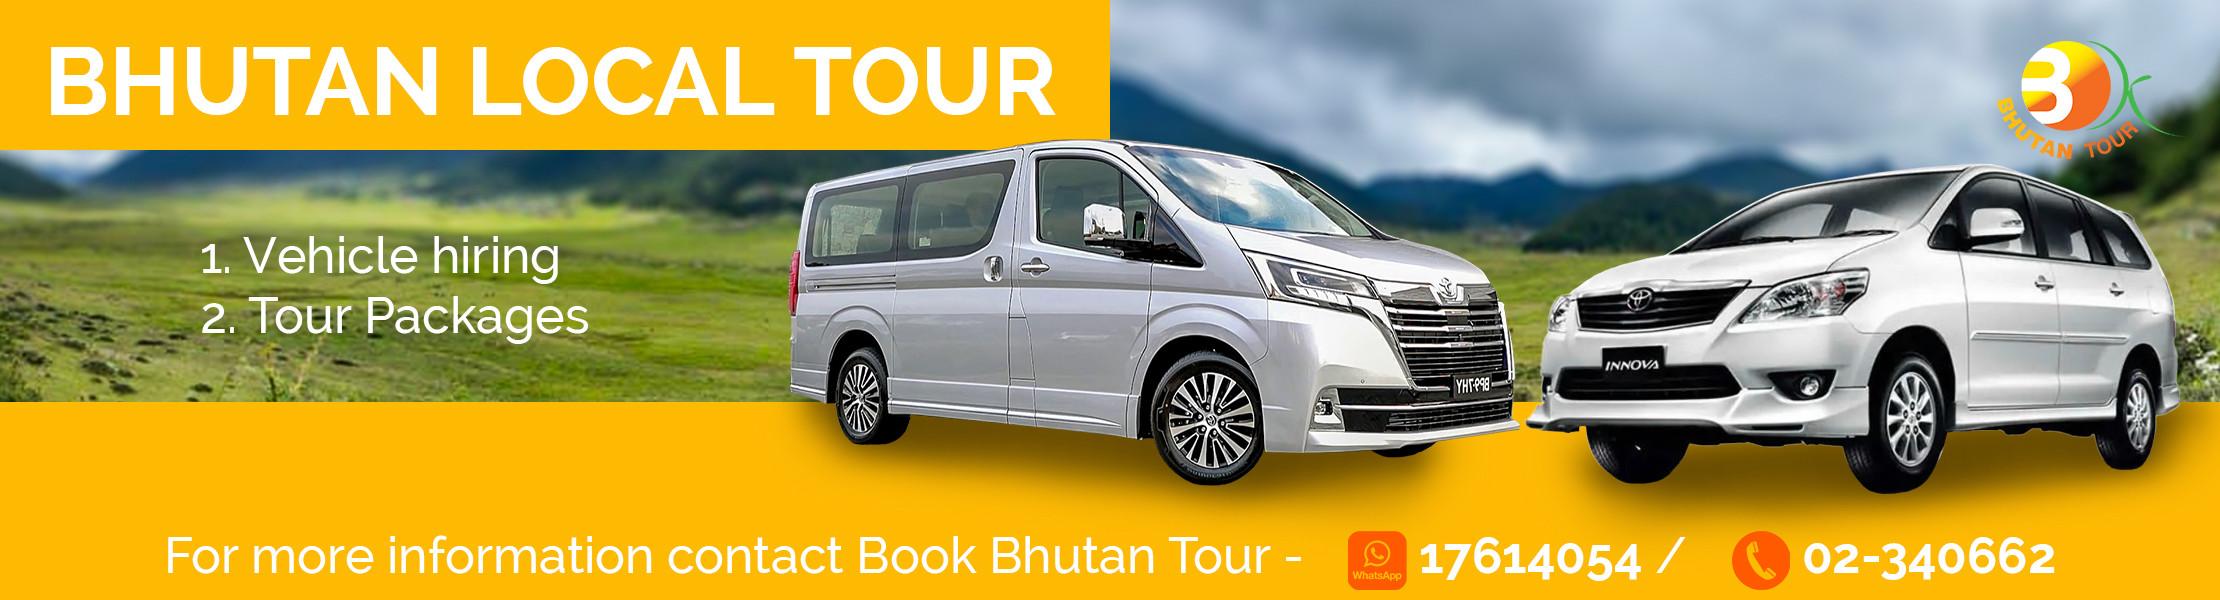 Bhutan Local Tour